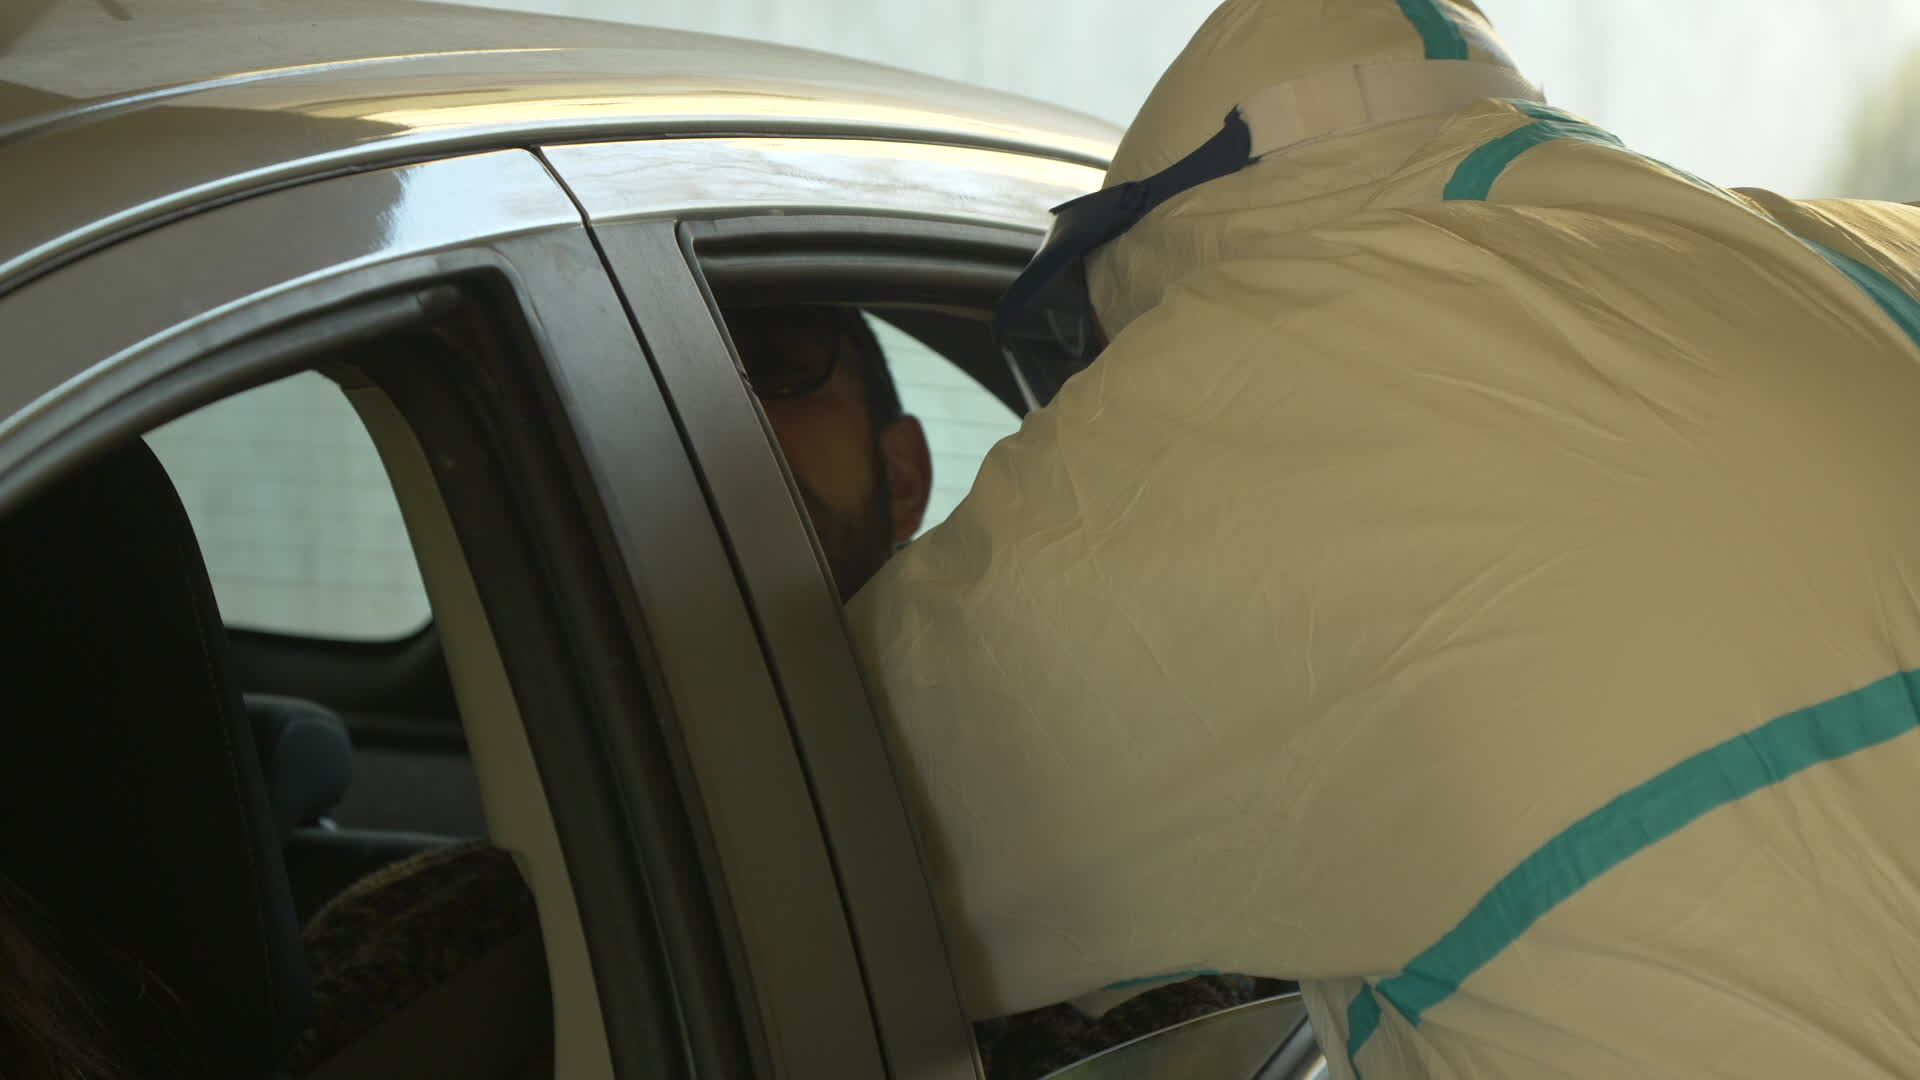 In Bologna Fastest Coronavirus Test, Inside Your Car